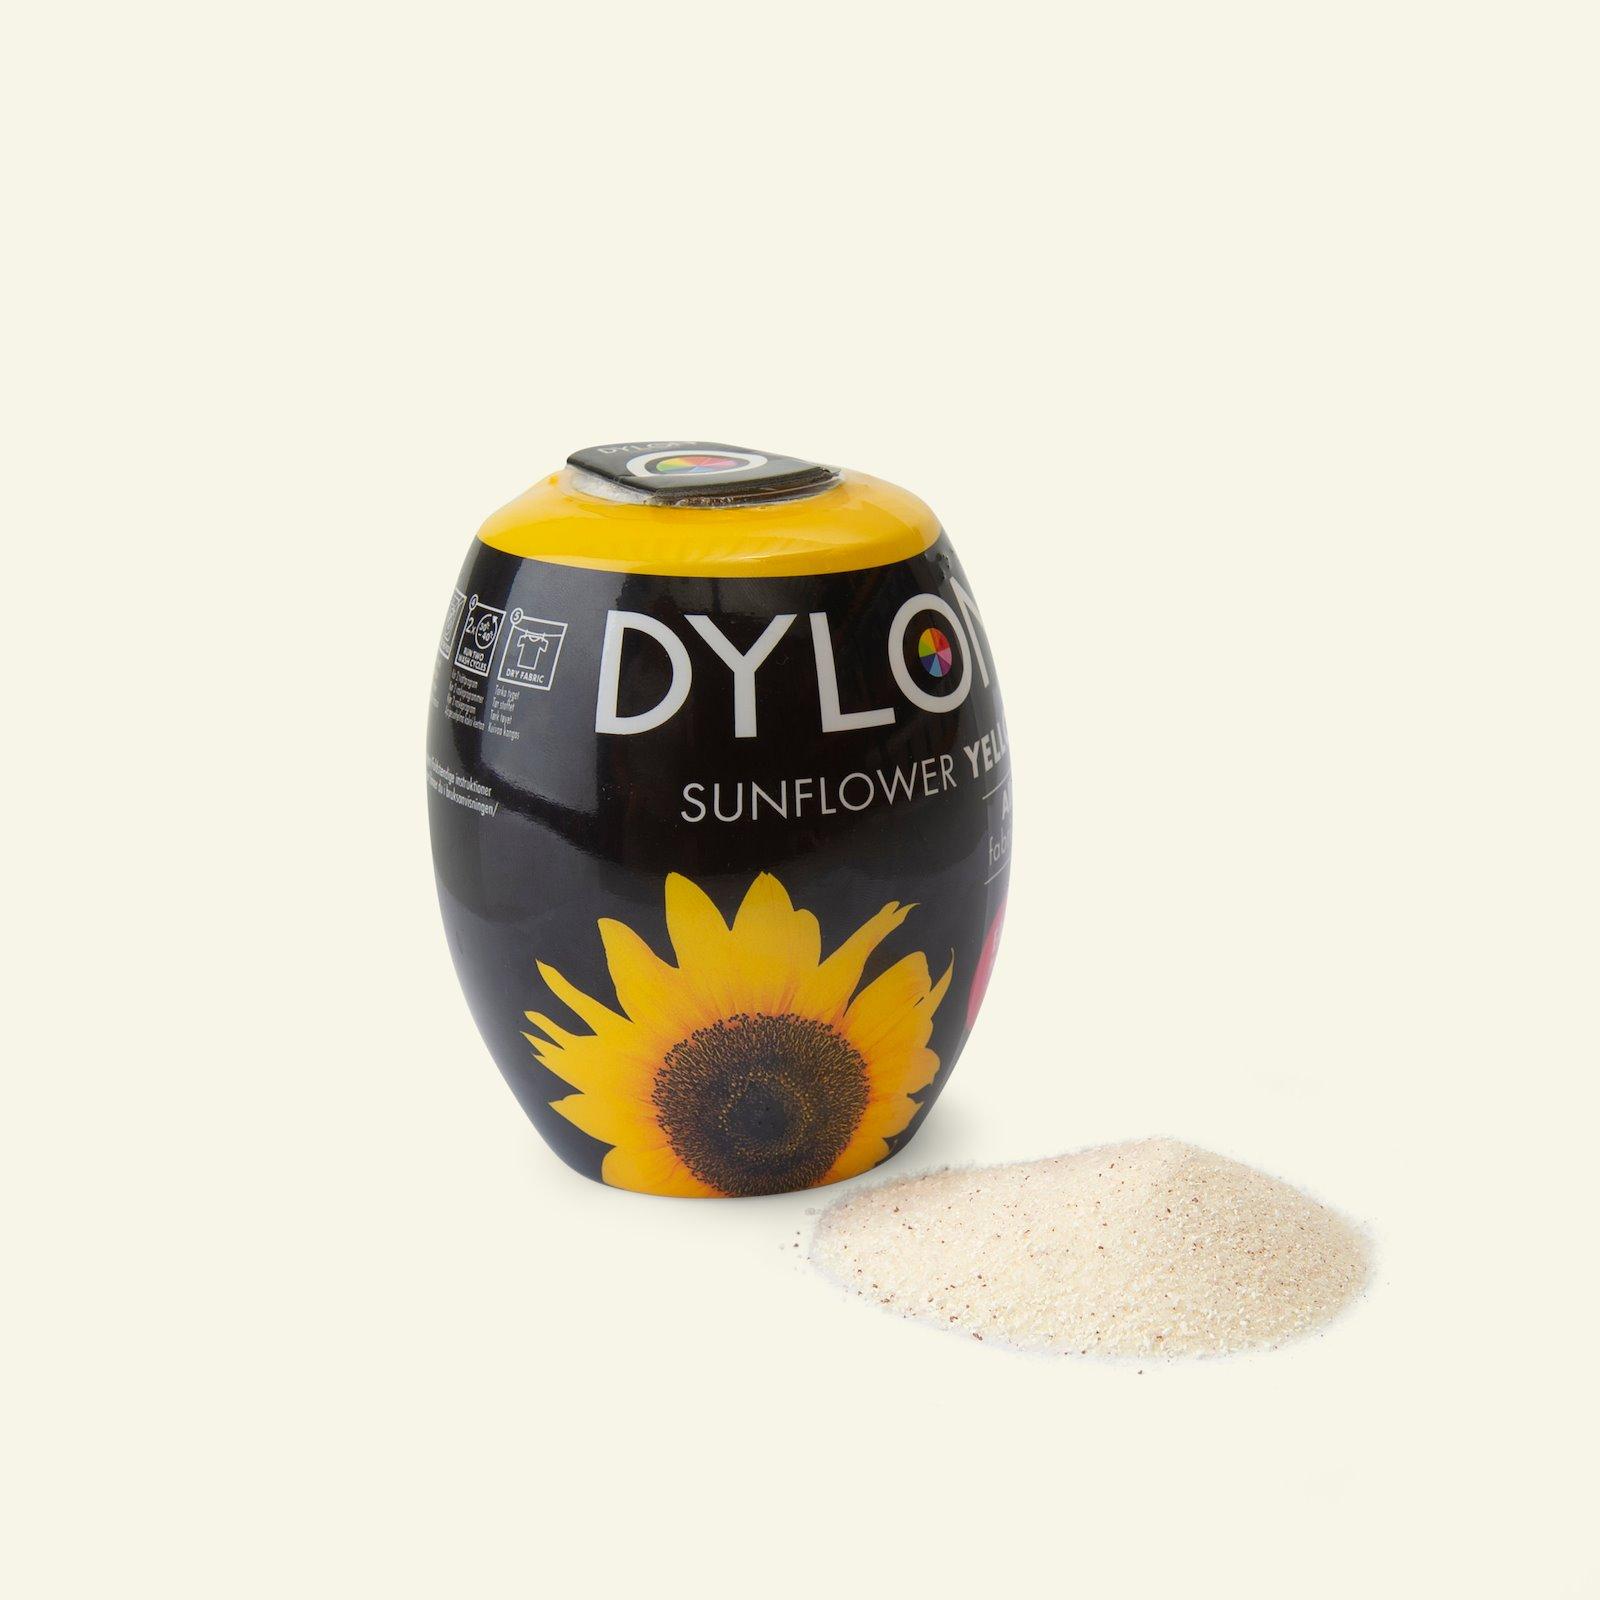 Dylon Maschinenfarbe, Gelb 29701_pack